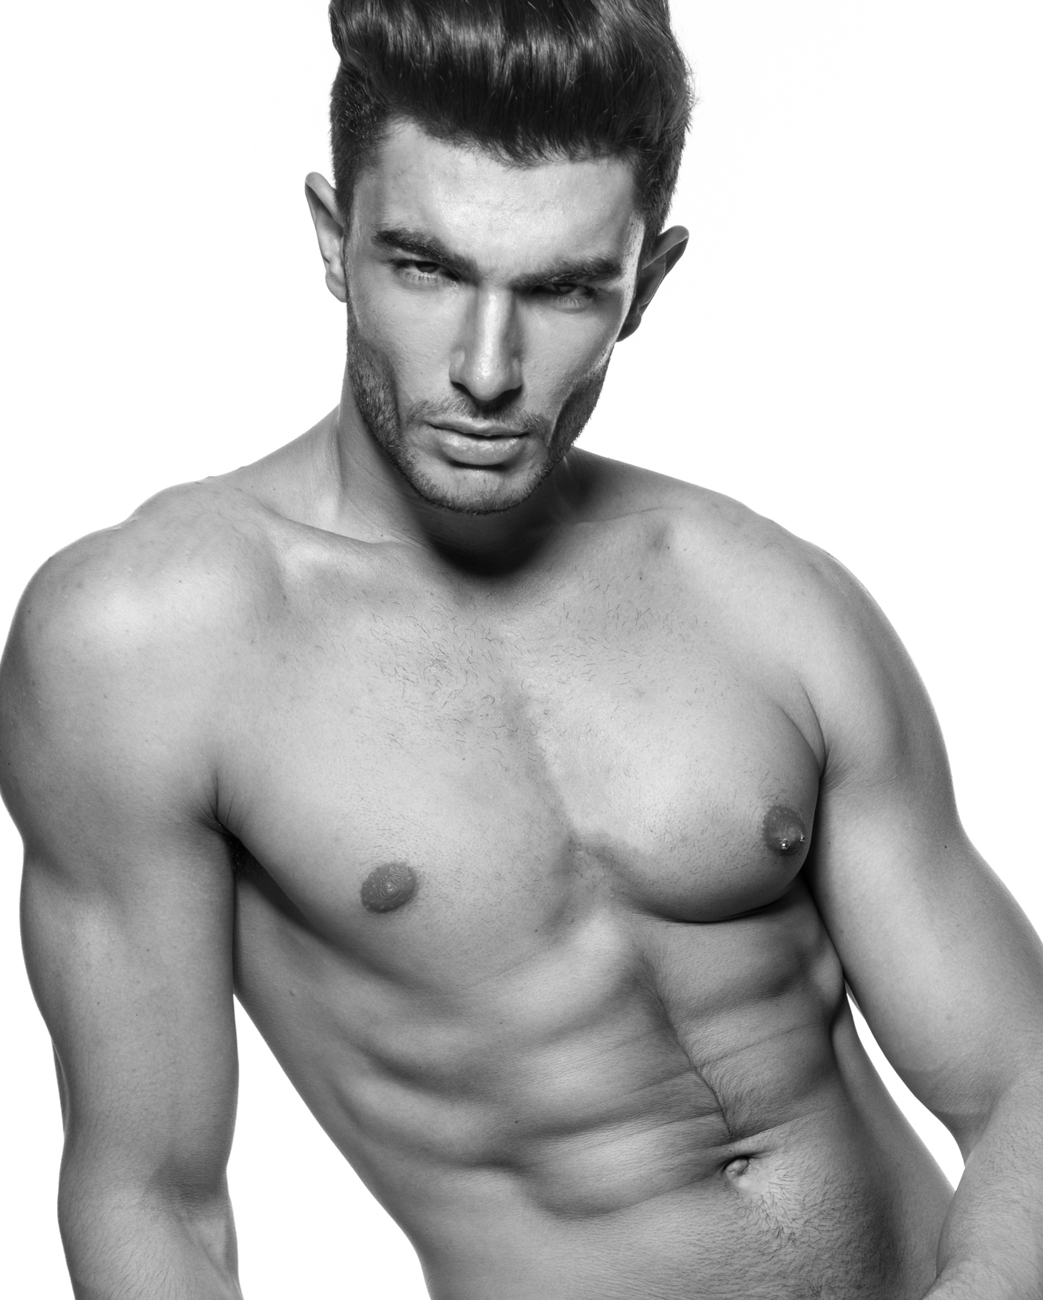 Adon Exclusive: Model Martin Atanasov By Juliana Soo